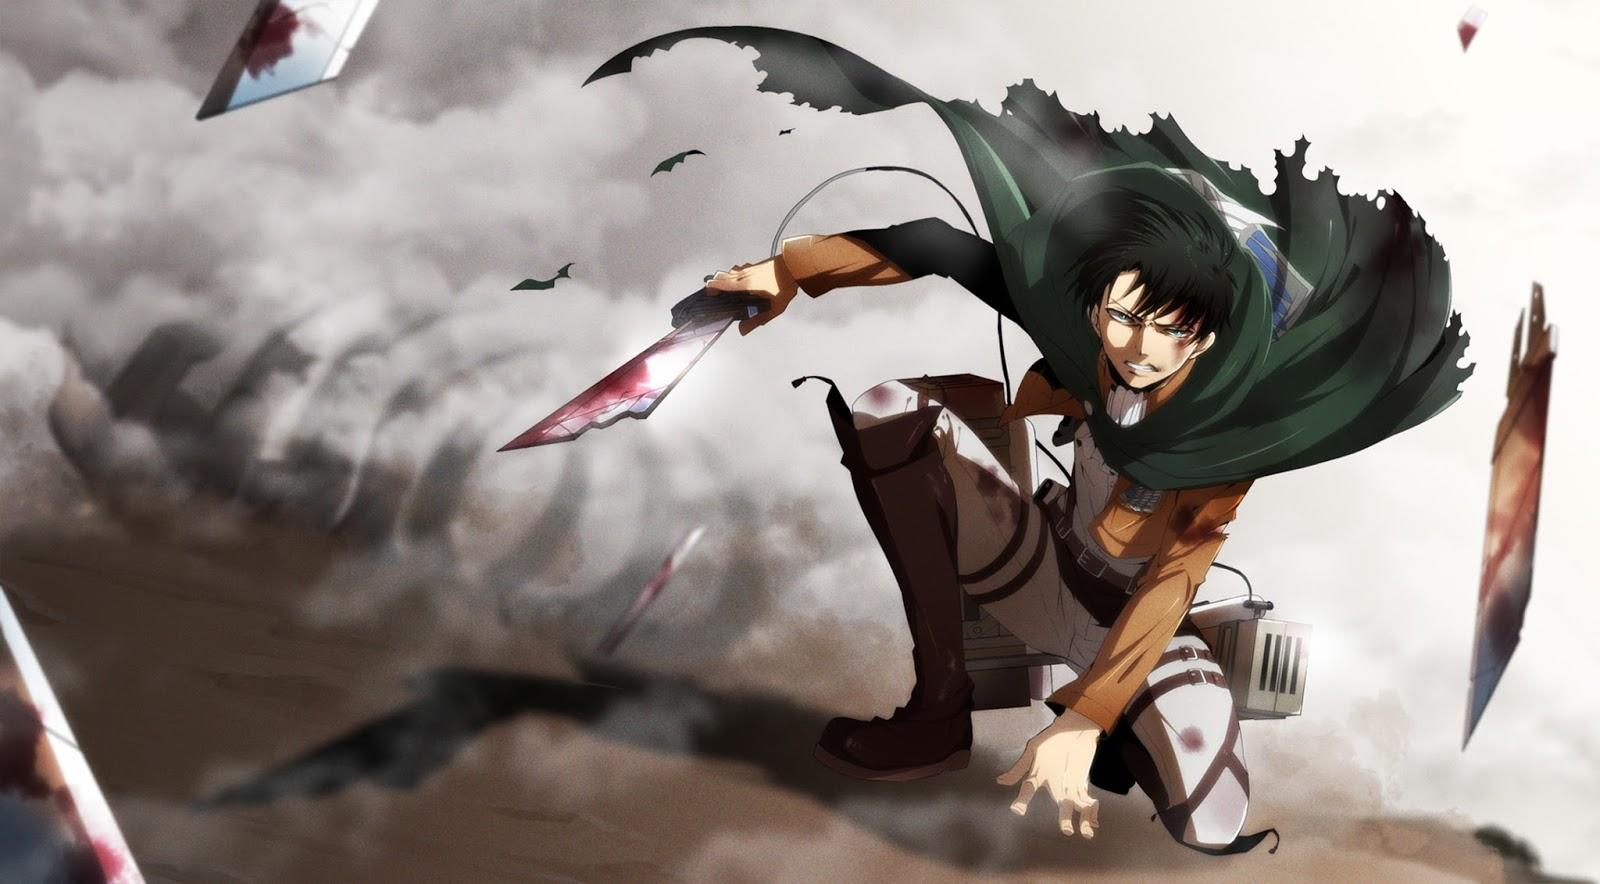 Levi Shingeki no Kyojin Attack on Titan Broken Blade Cape Male Guy 1600x884